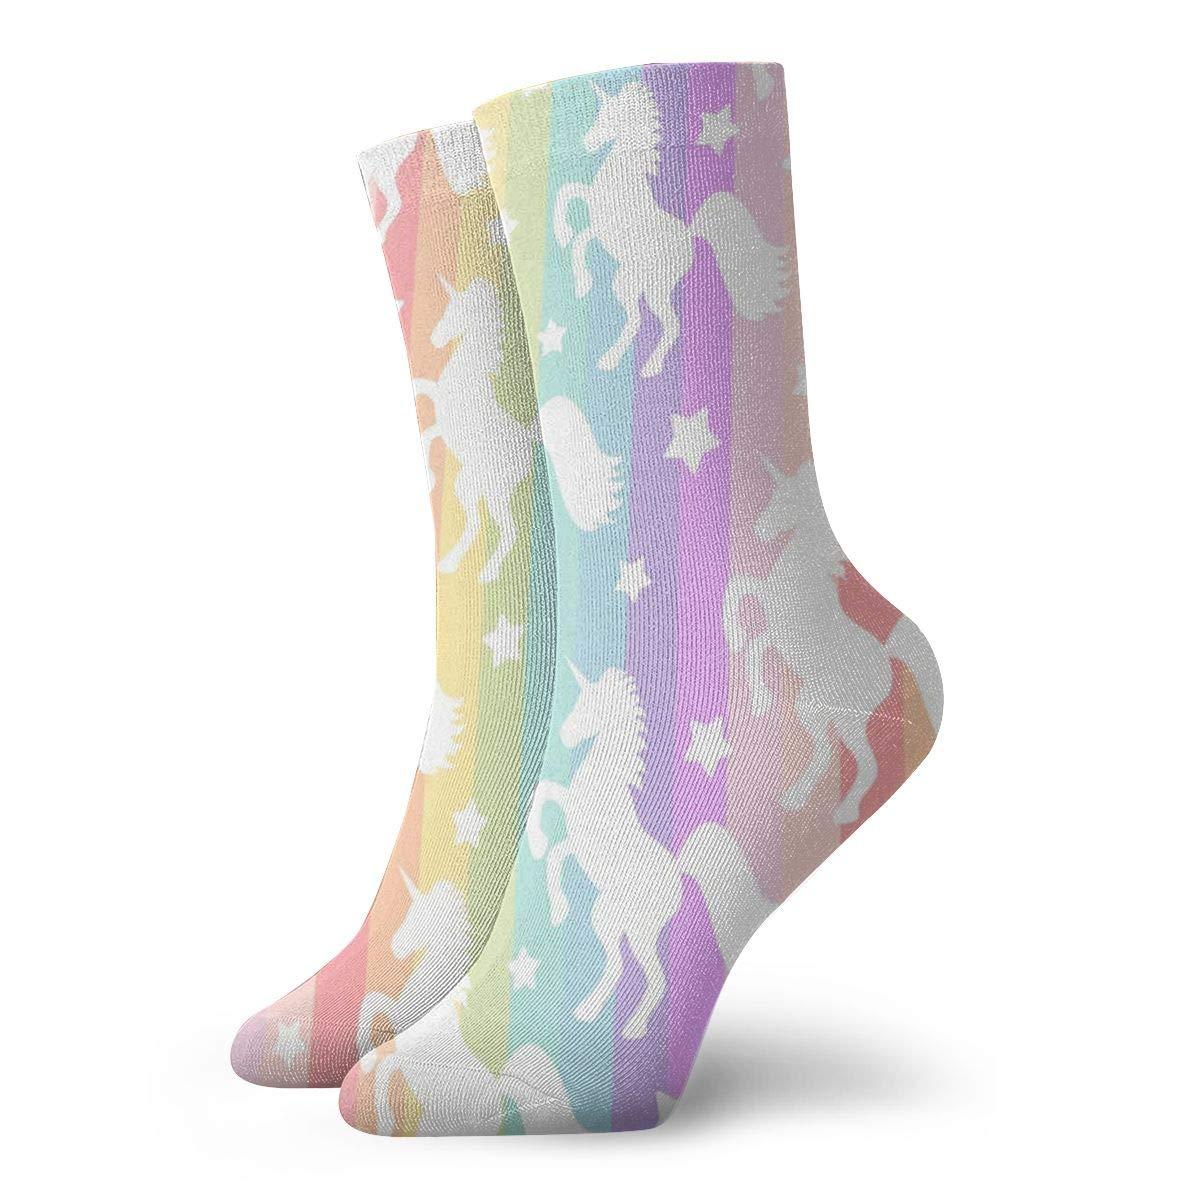 WEEDKEYCAT Unicorn Horse of Rainbow Striped Adult Short Socks Cotton Gym Socks for Mens Womens Yoga Hiking Cycling Running Soccer Sports